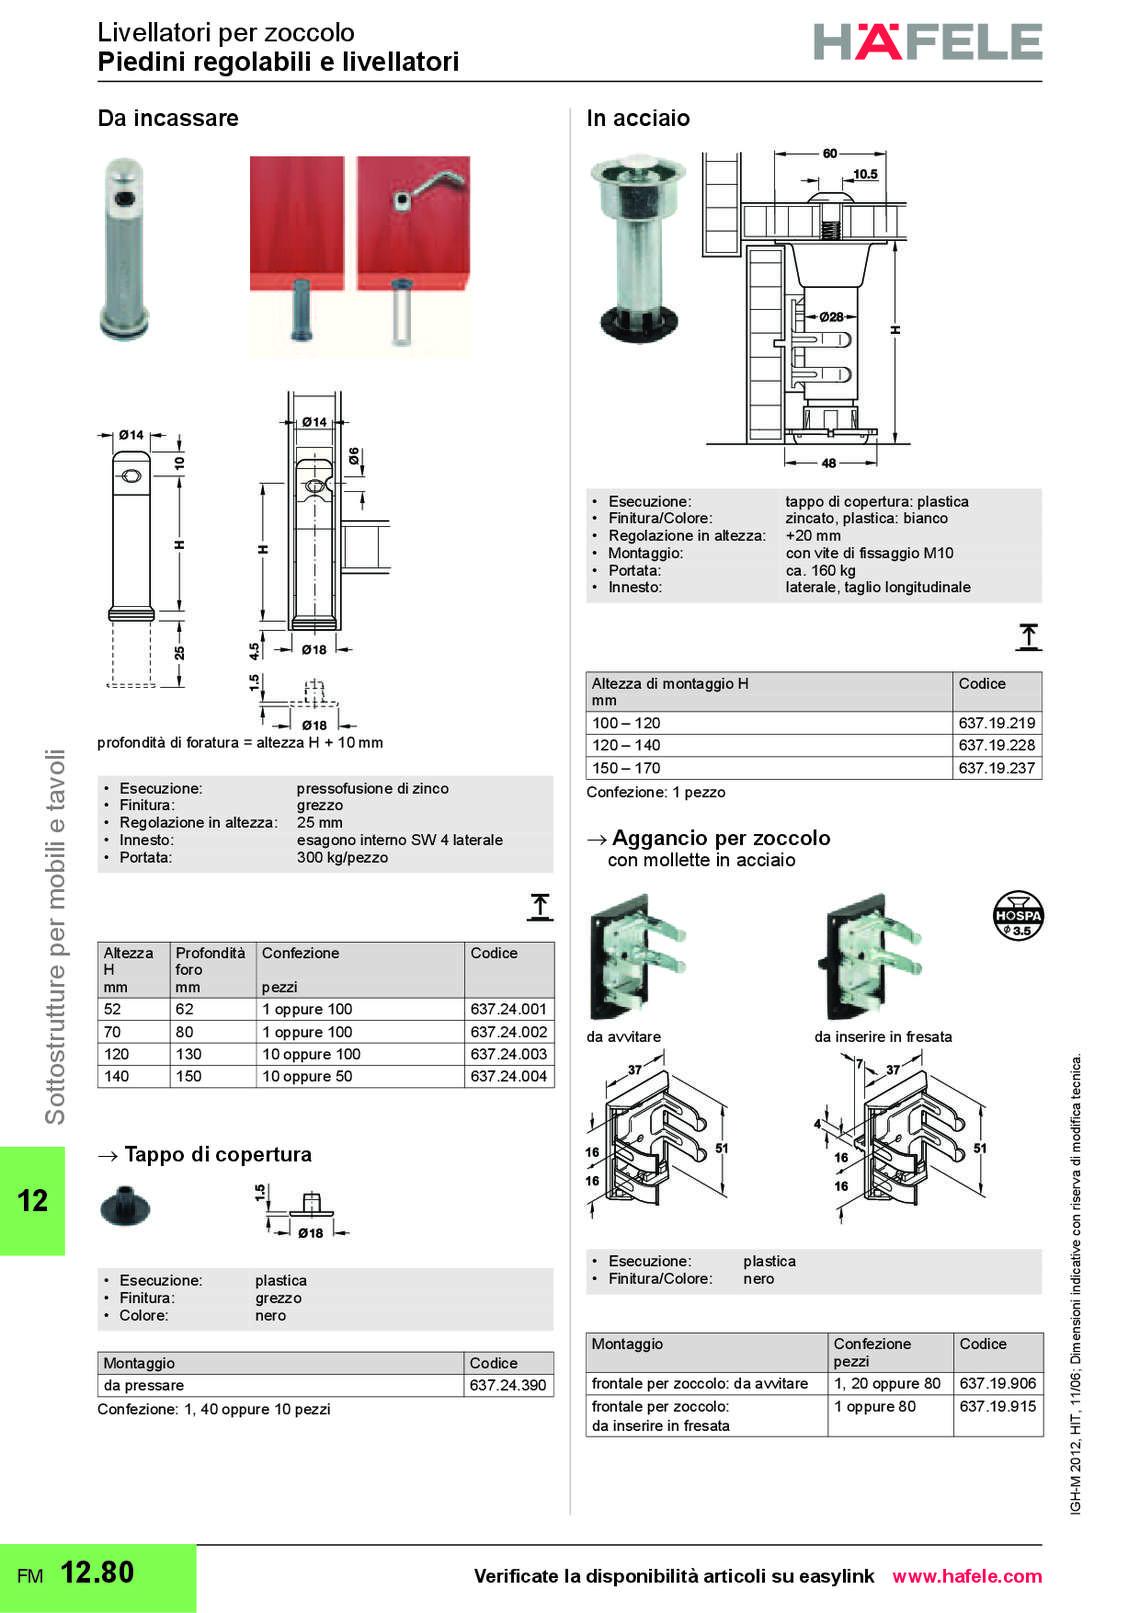 hafele-sottostrutture-per-mobili_83_103.jpg